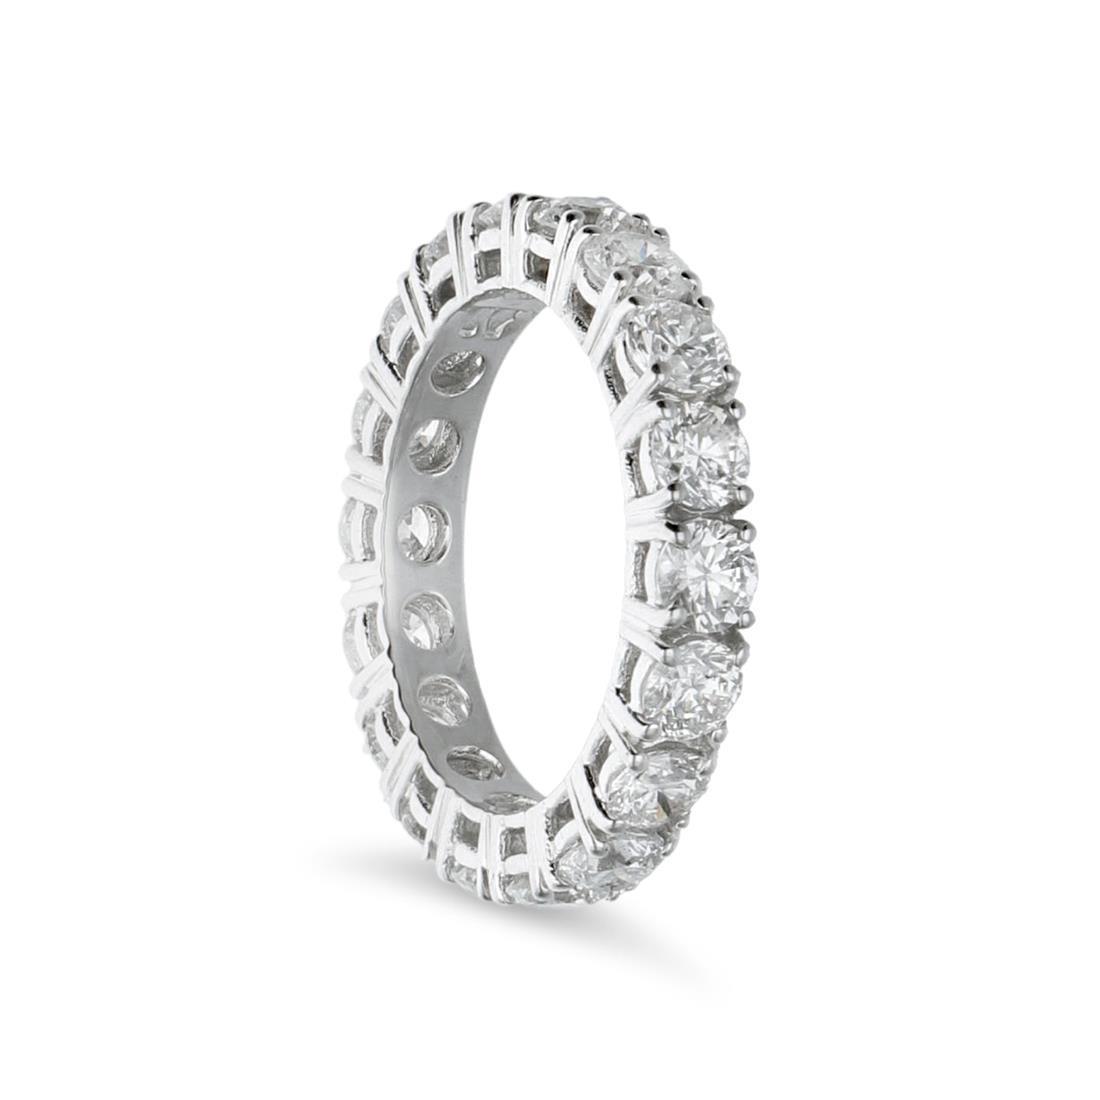 Eternity ring with diamonds - ALFIERI & ST. JOHN